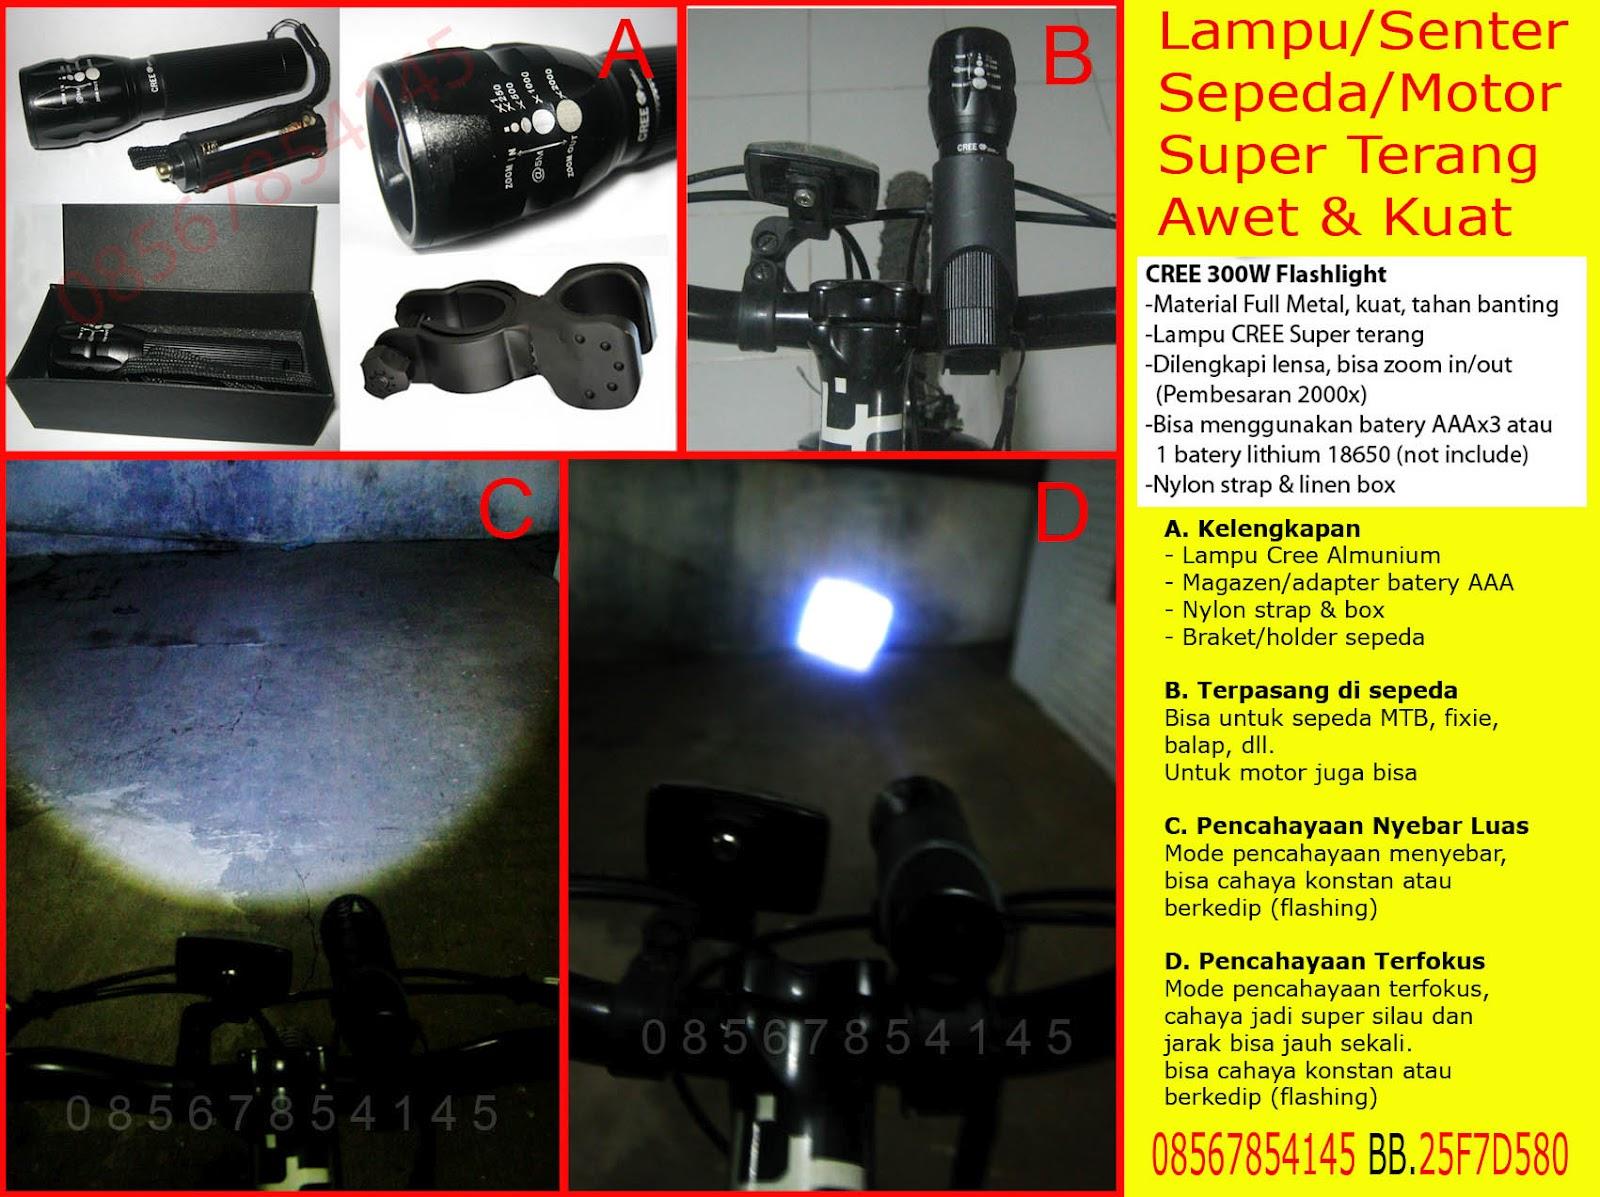 Senter Police Lampu Sepeda Stungun Pepper Spray